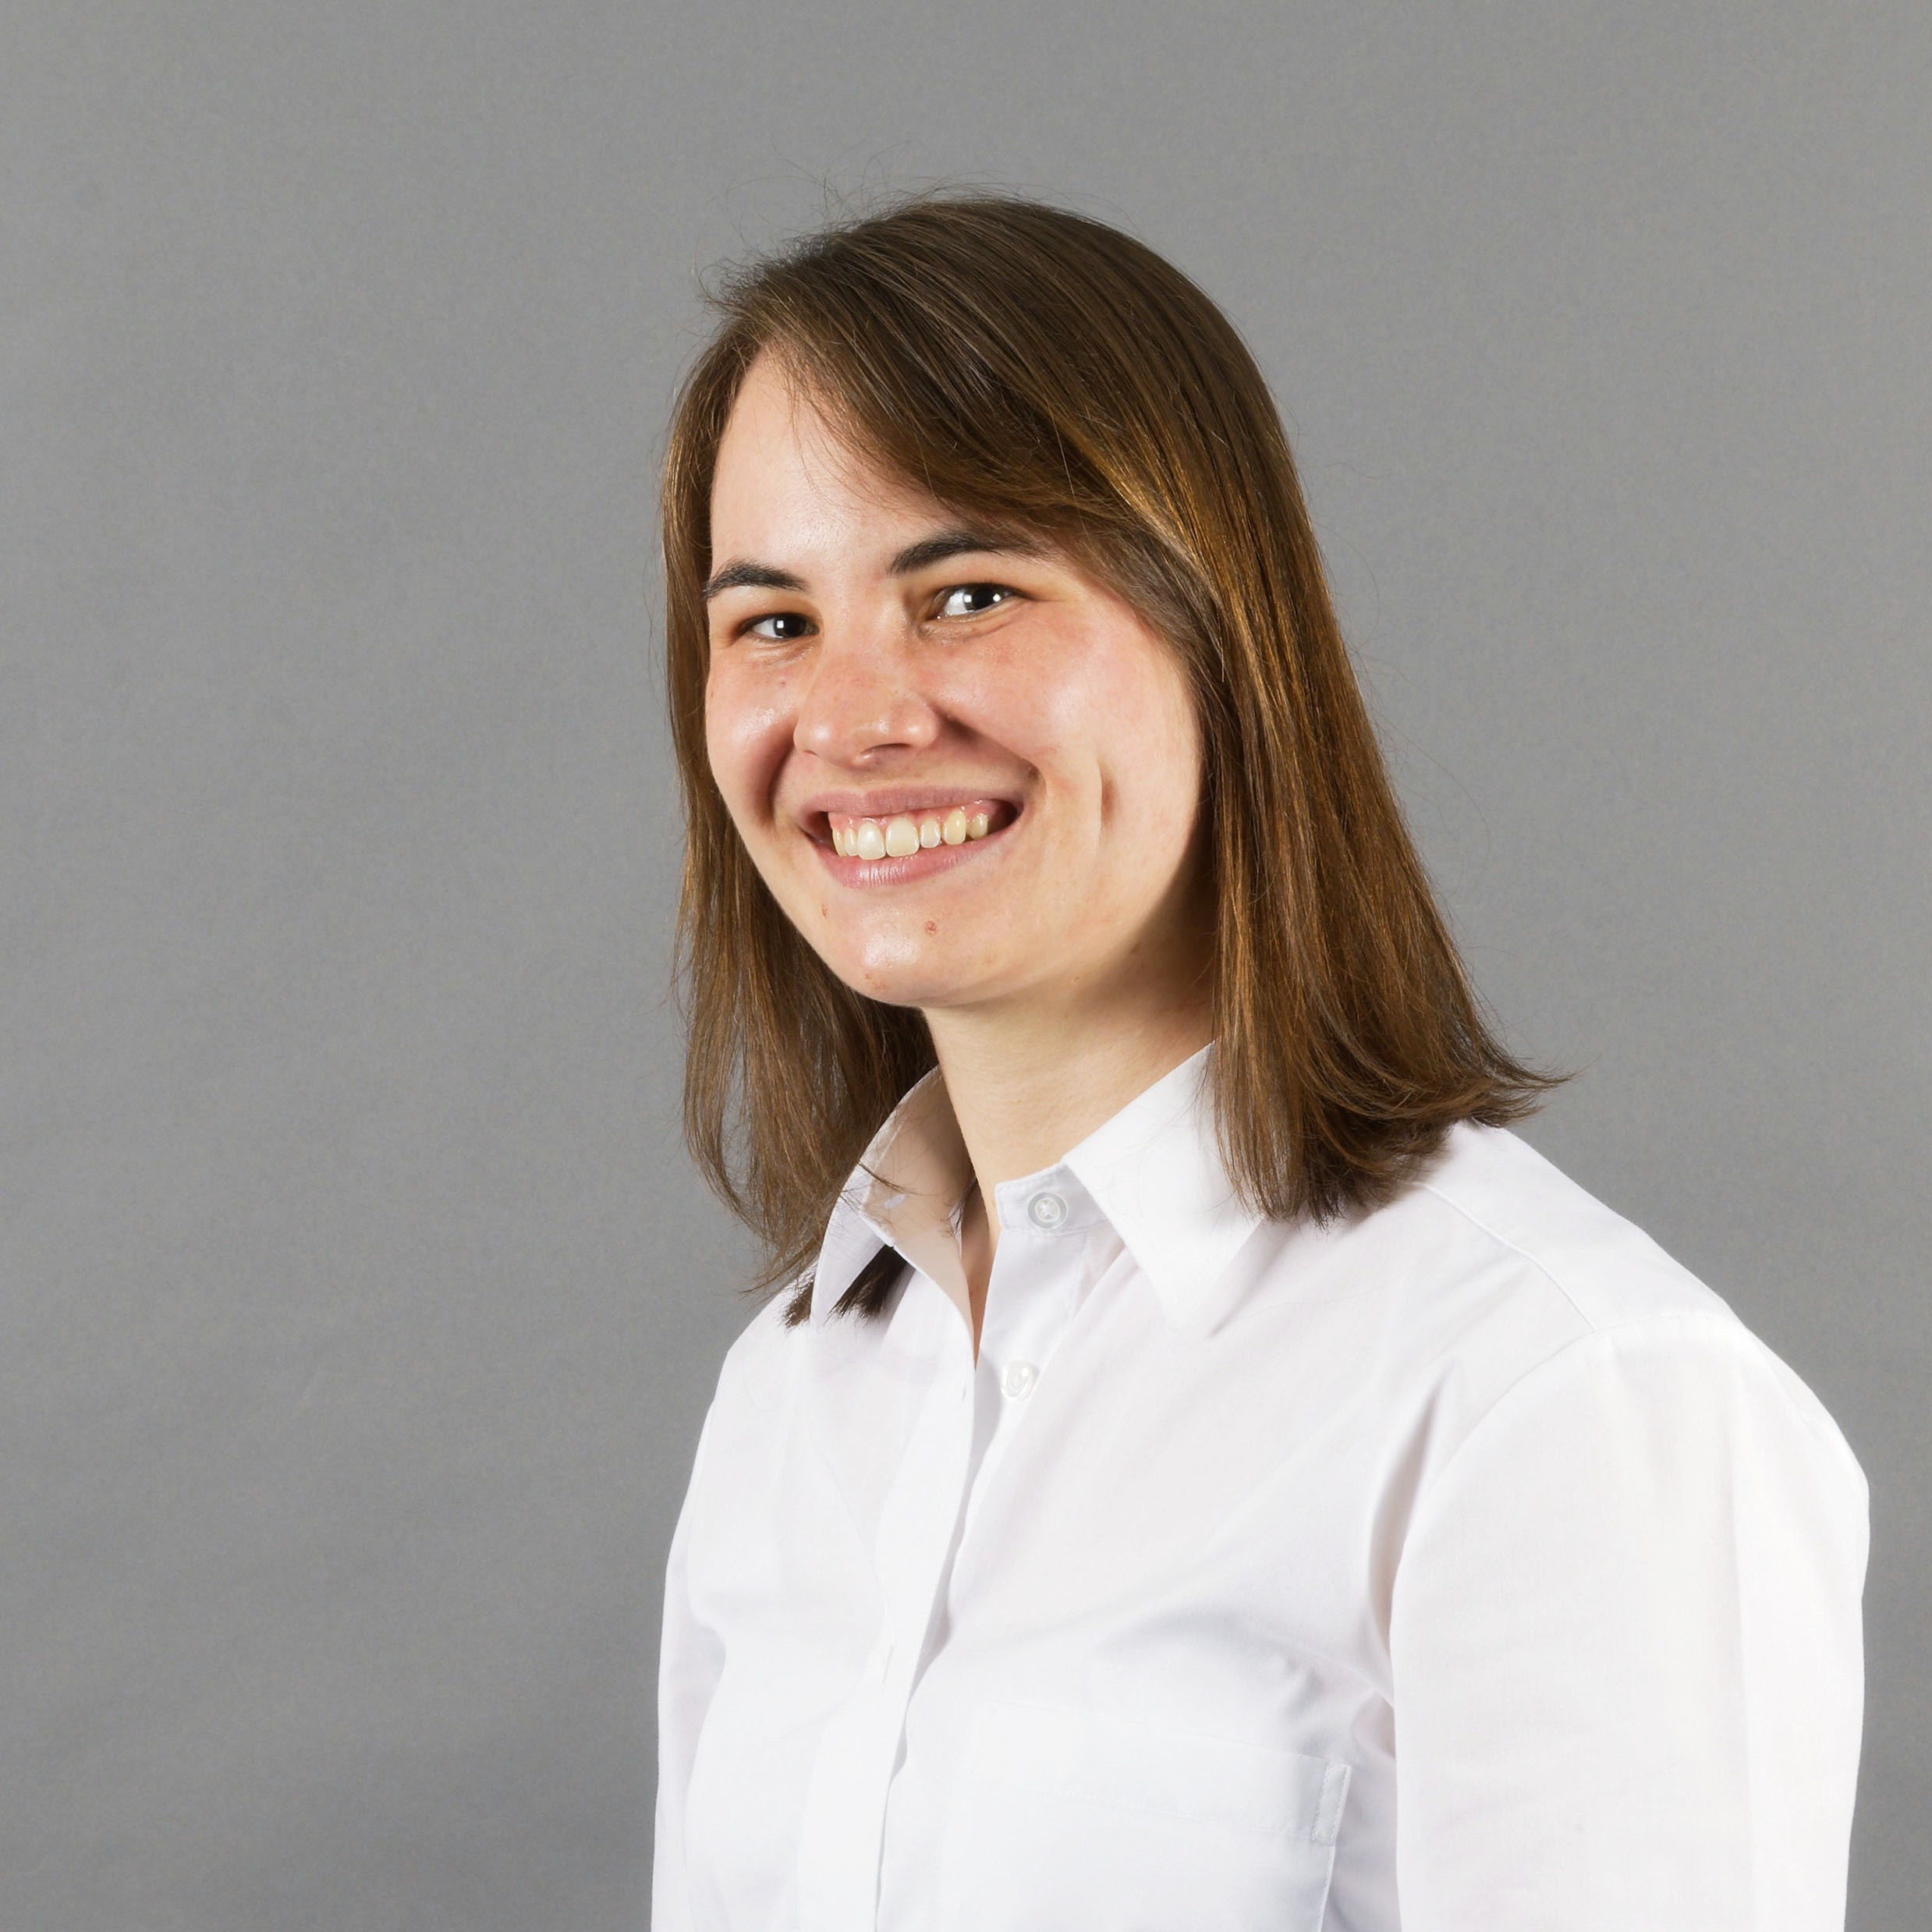 Livia Knecht